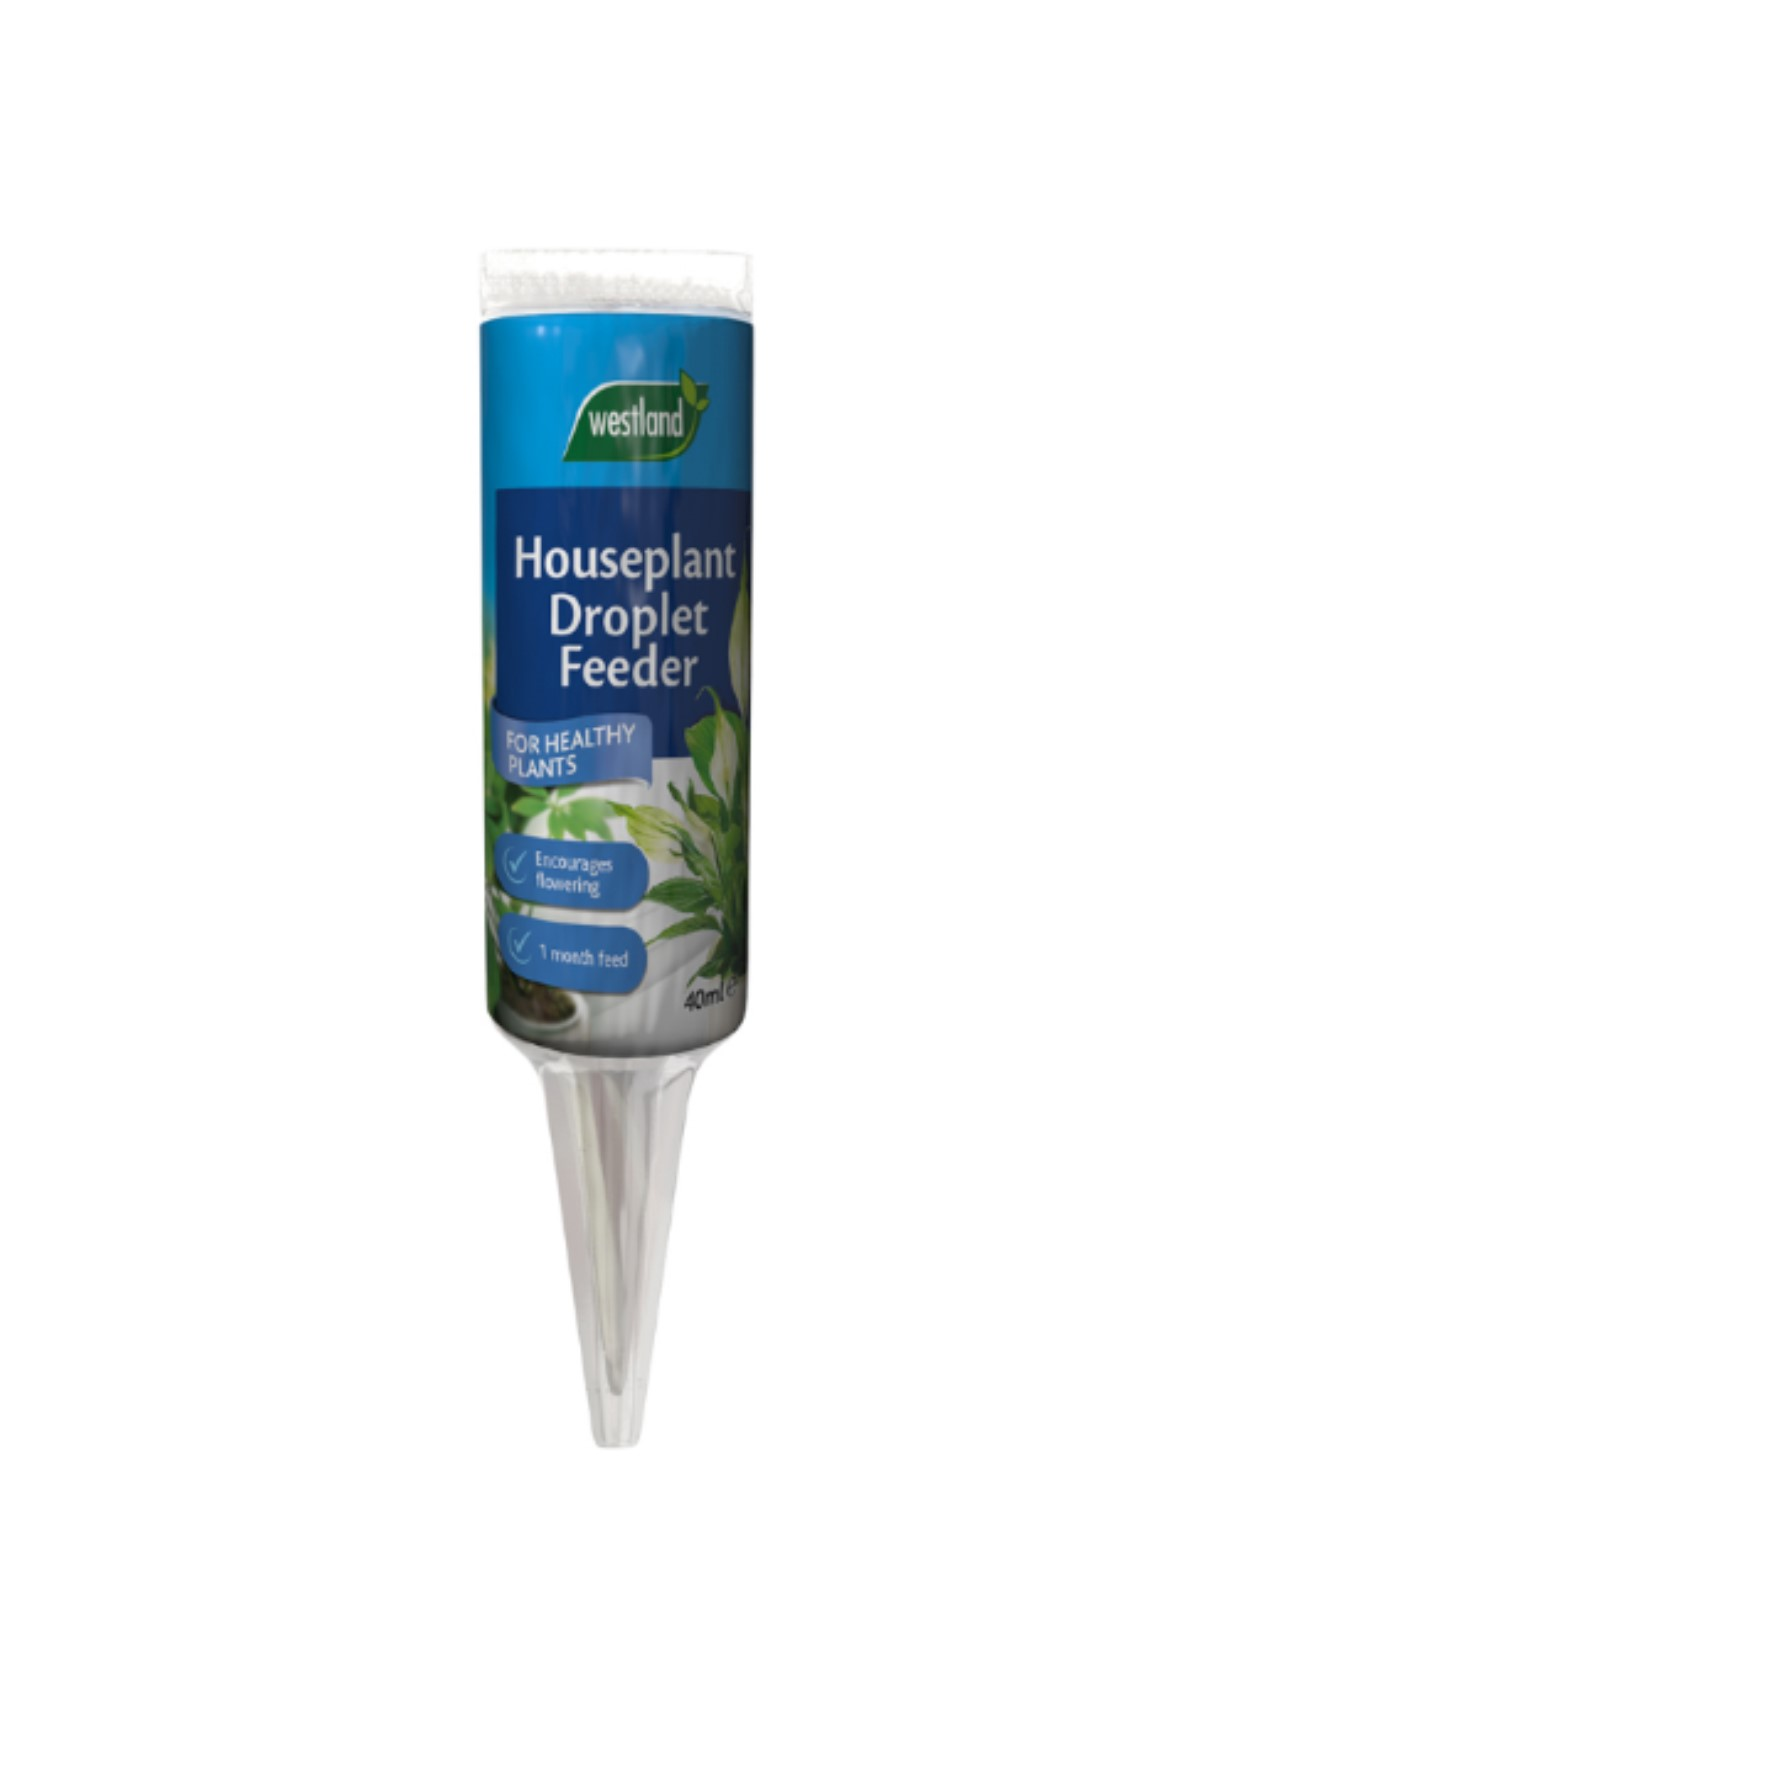 Houseplant Droplet Feeder